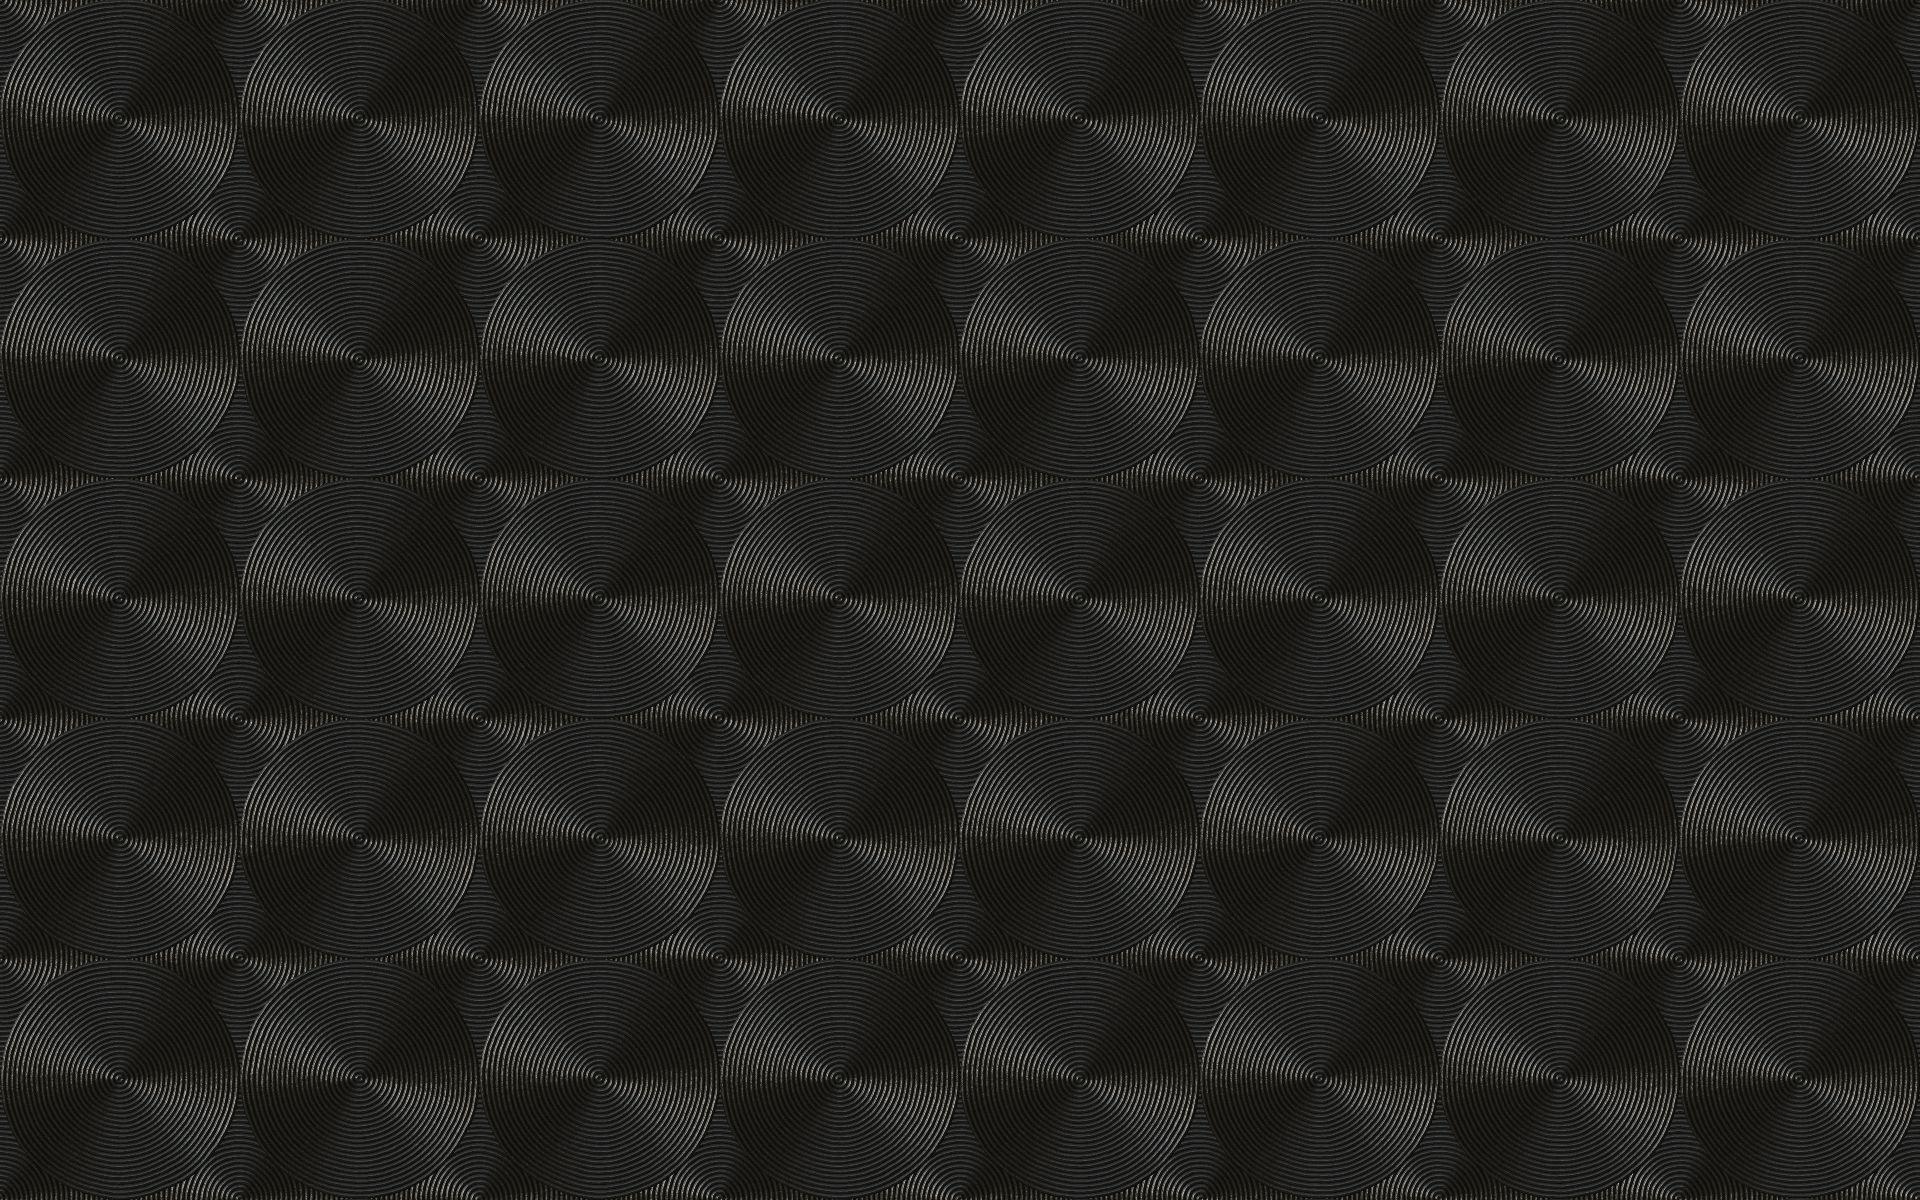 Textured Black Art Hd Wallpaper Background Image 1920x1200 Id 831708 Wallpaper Abyss